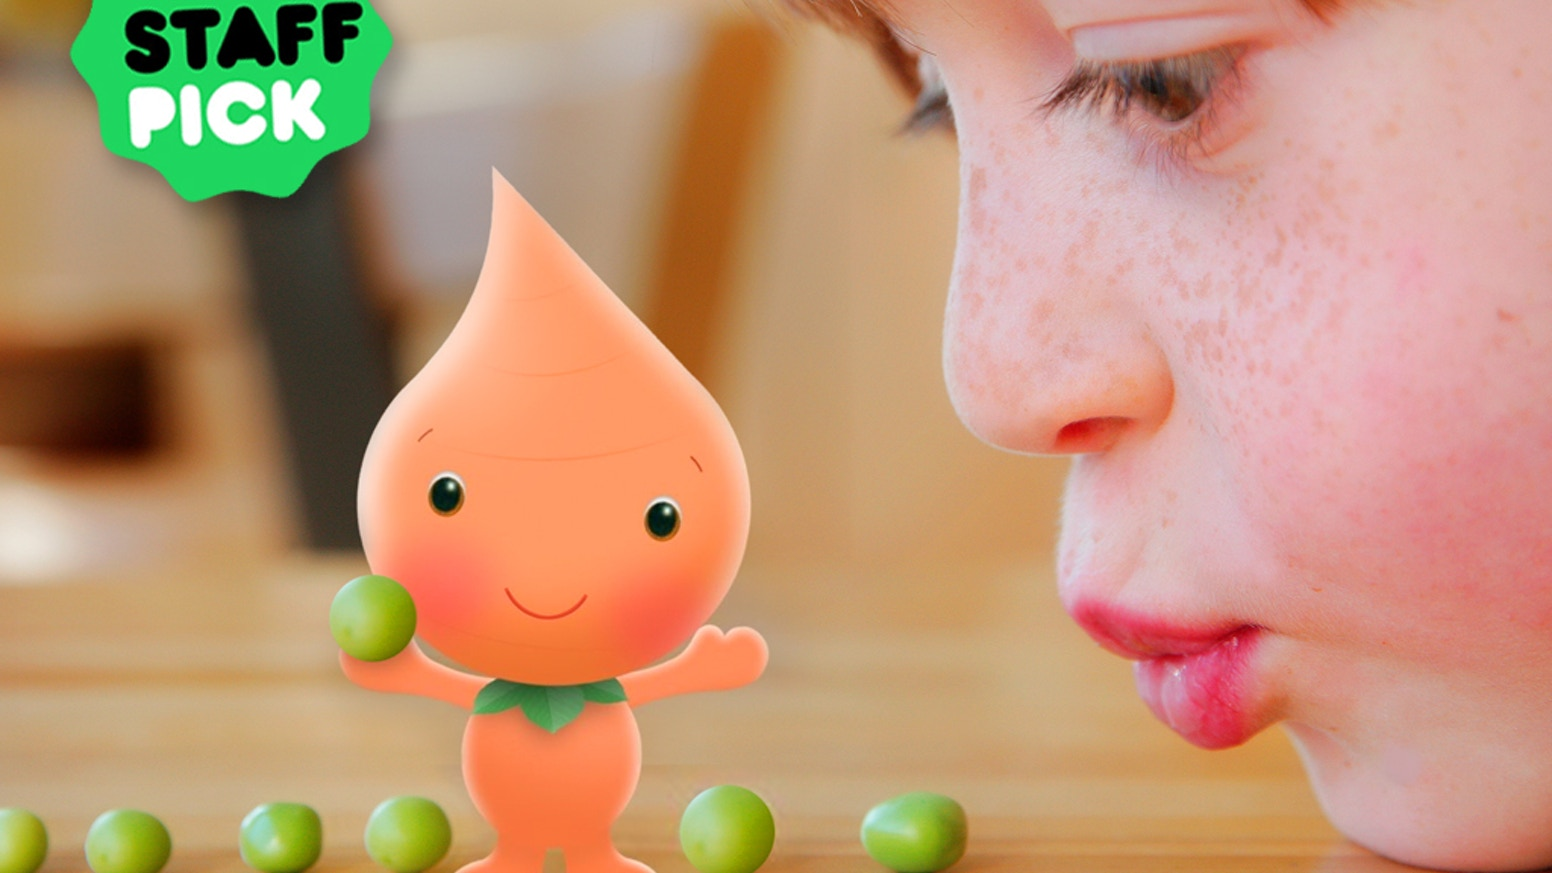 Blue's Clues creator Traci P. Johnson's animated TV show for preschoolers based on the award winning healthy eating app Rainbow Power.